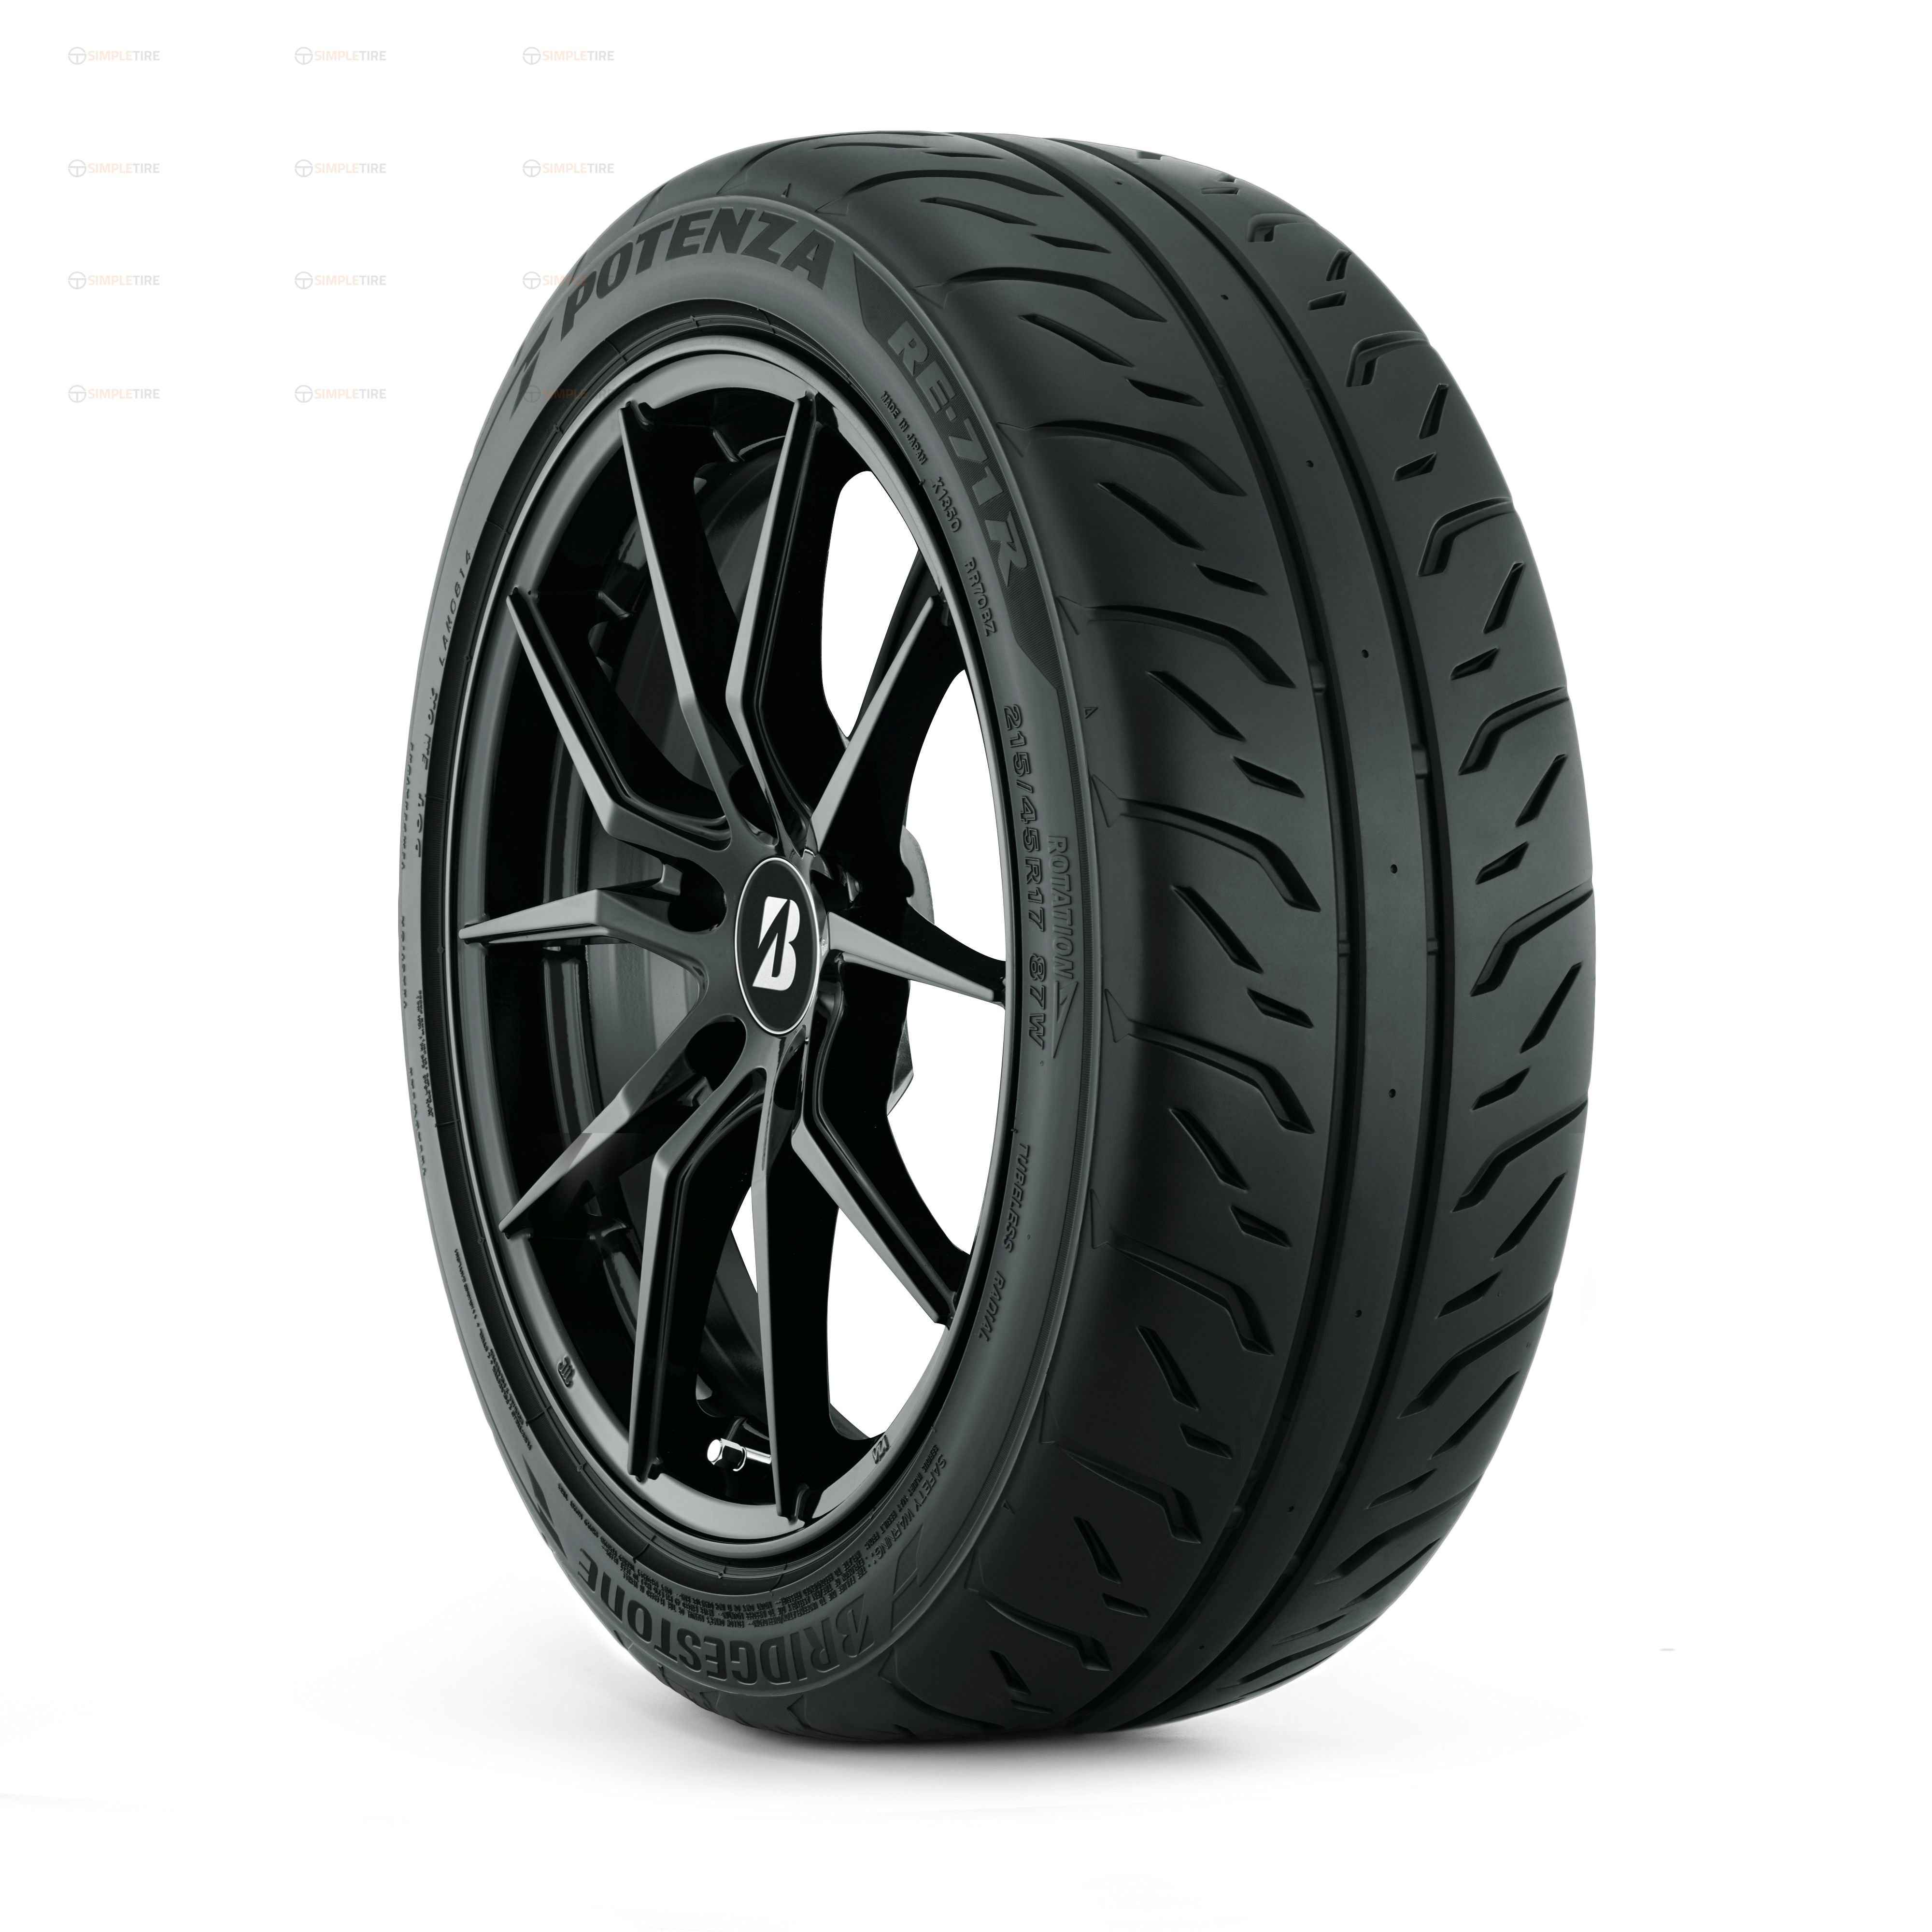 146761 255/40R17 Potenza RE71 Bridgestone